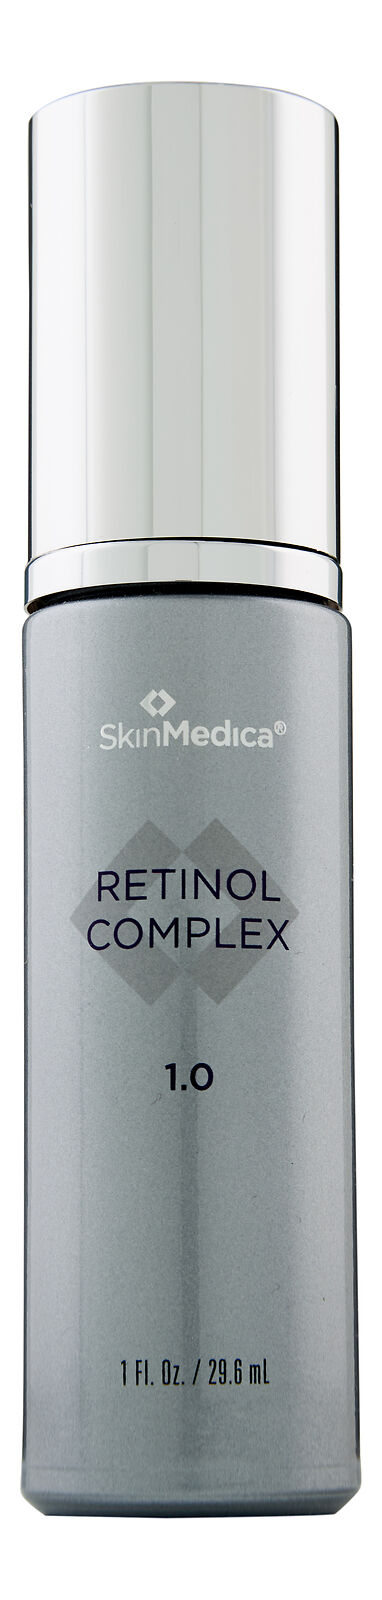 SkinMedica Retinol Complex 1.0 1 oz. Skin Treatment 1